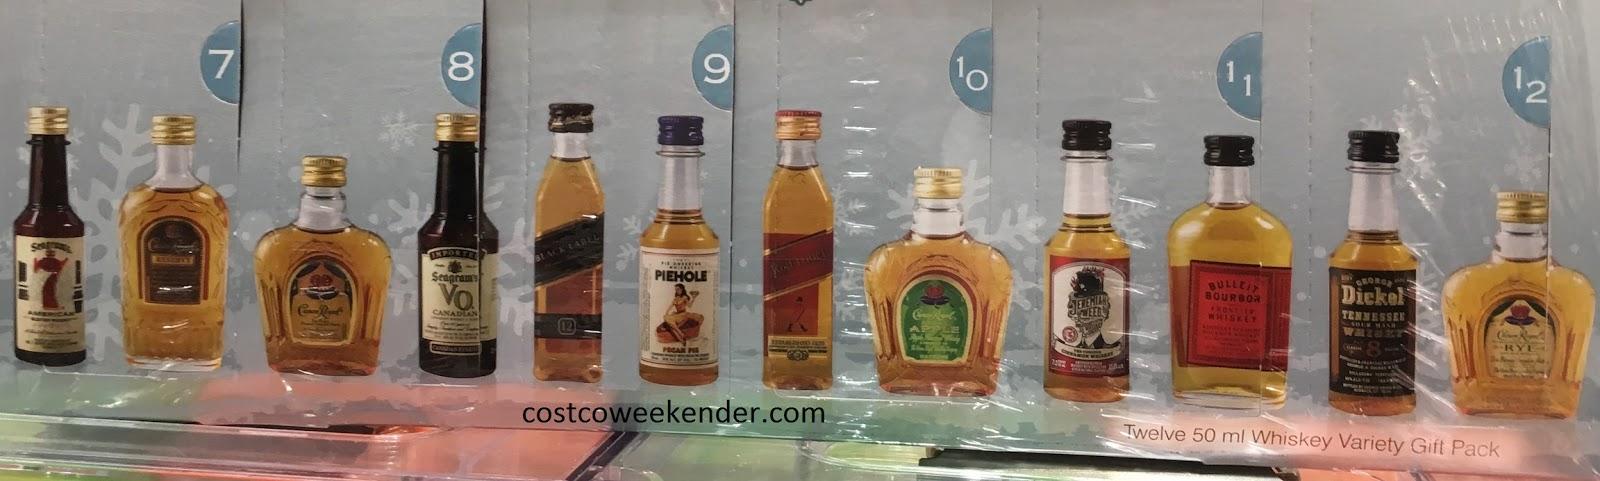 12 different bottles of whiskey